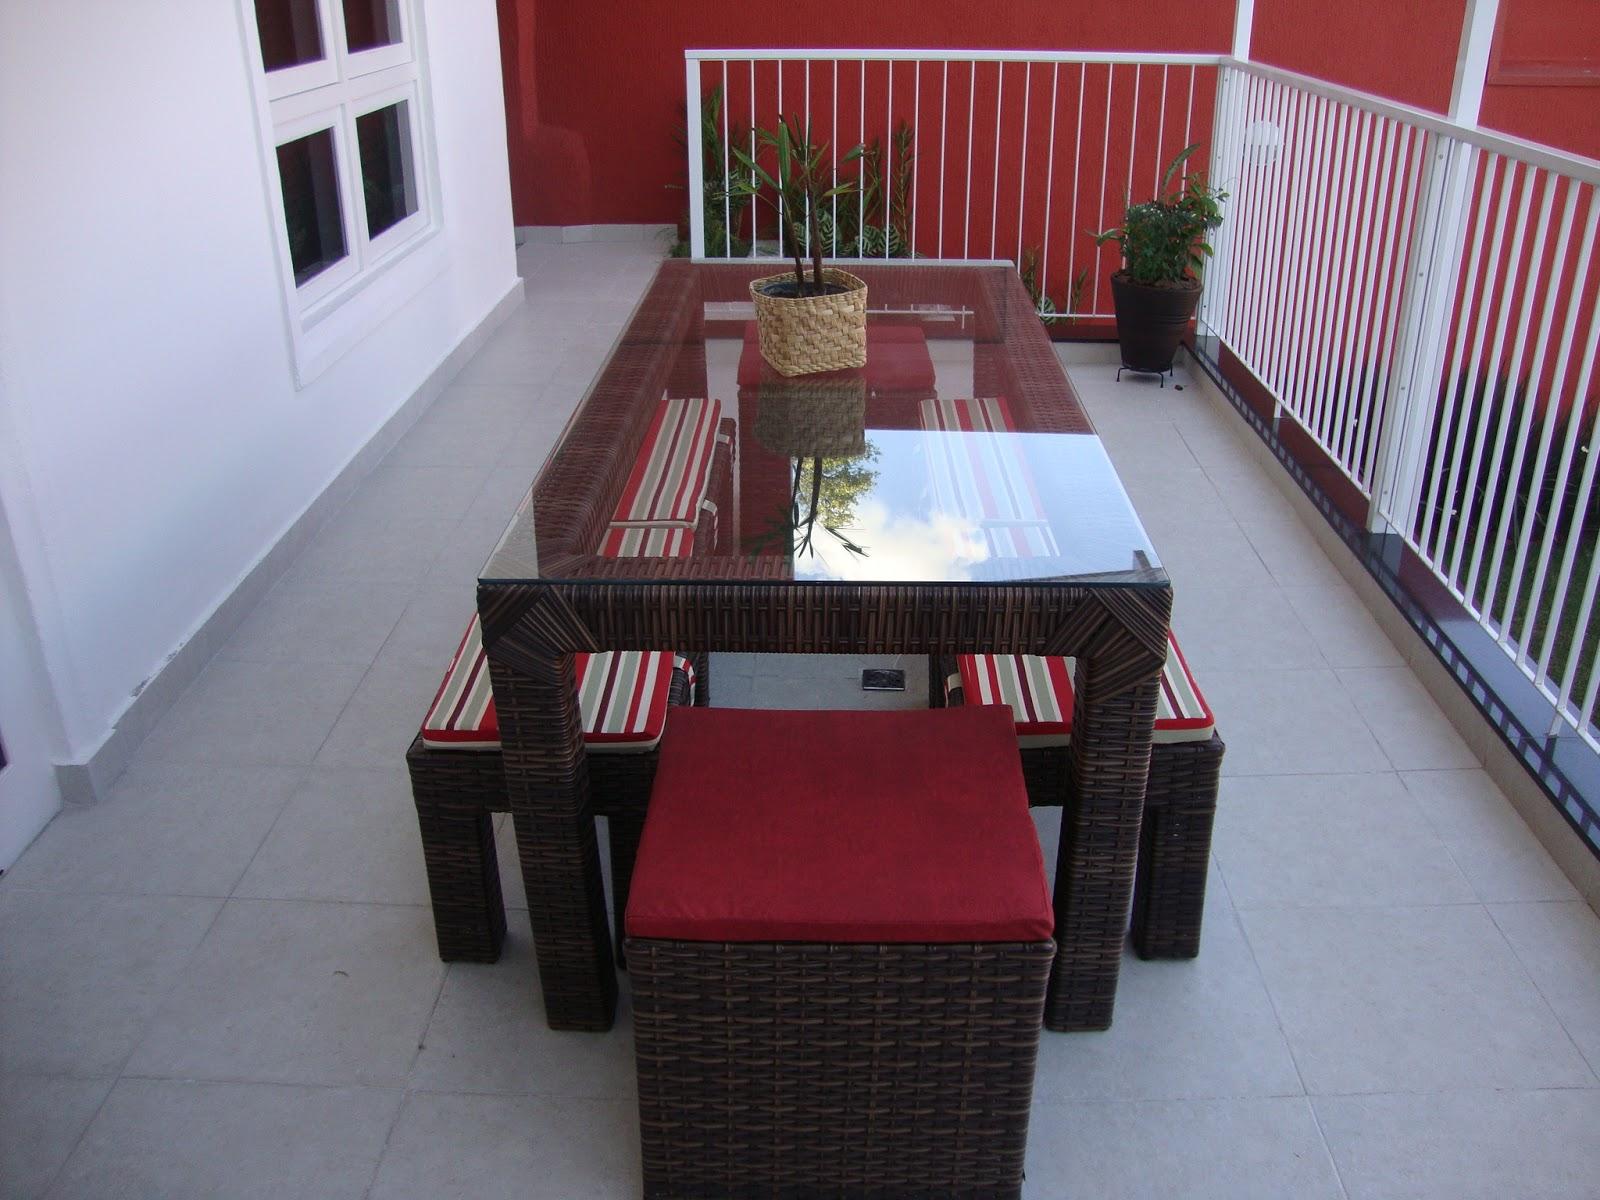 Para sacadas áreas gourmet sala de jantar varandas piscinas e  #732A2E 1600x1200